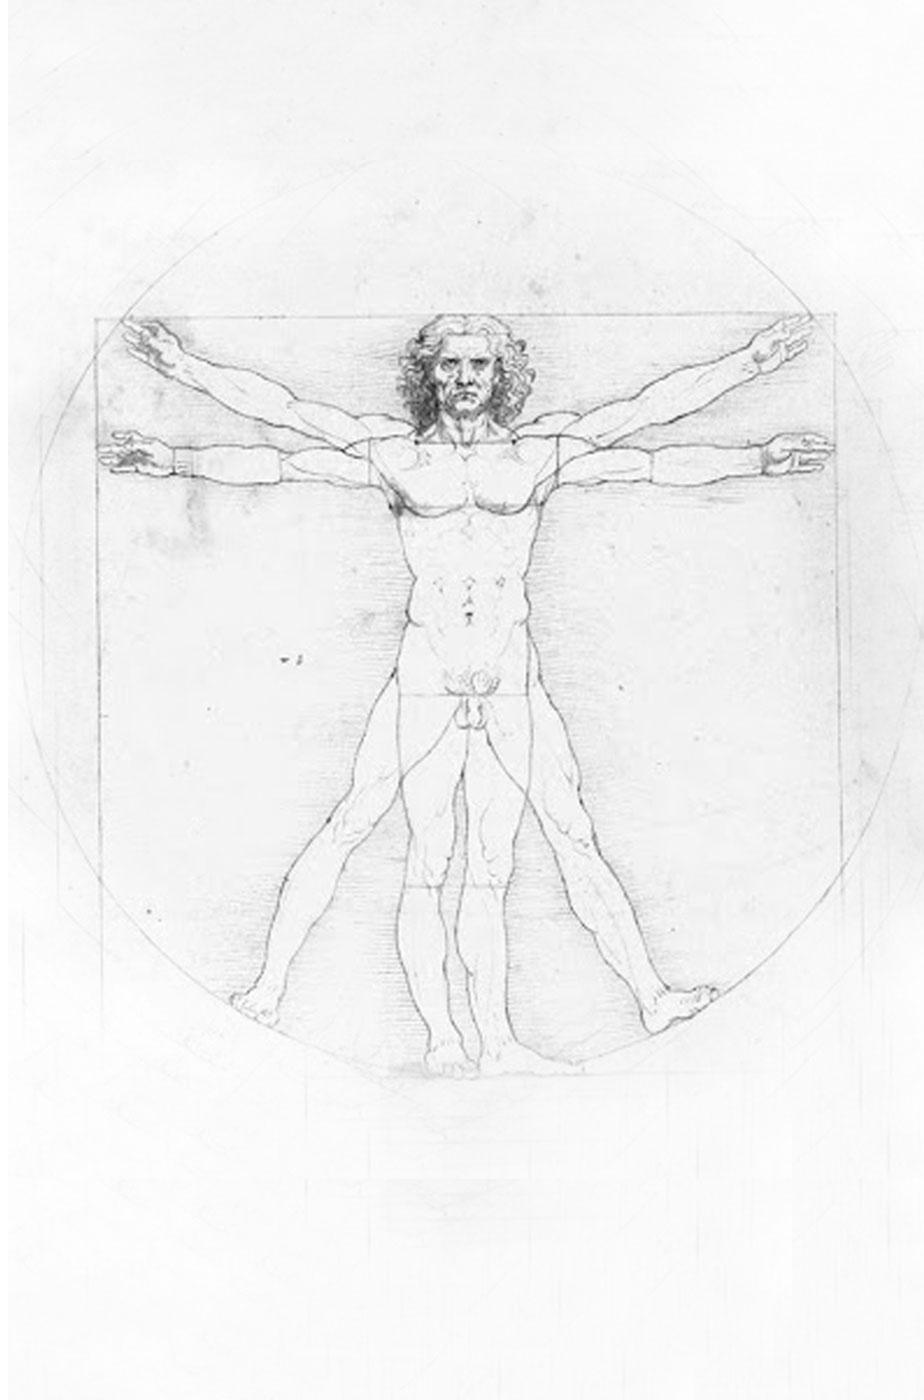 Cursos de historia del arte online | Vitruvio arte